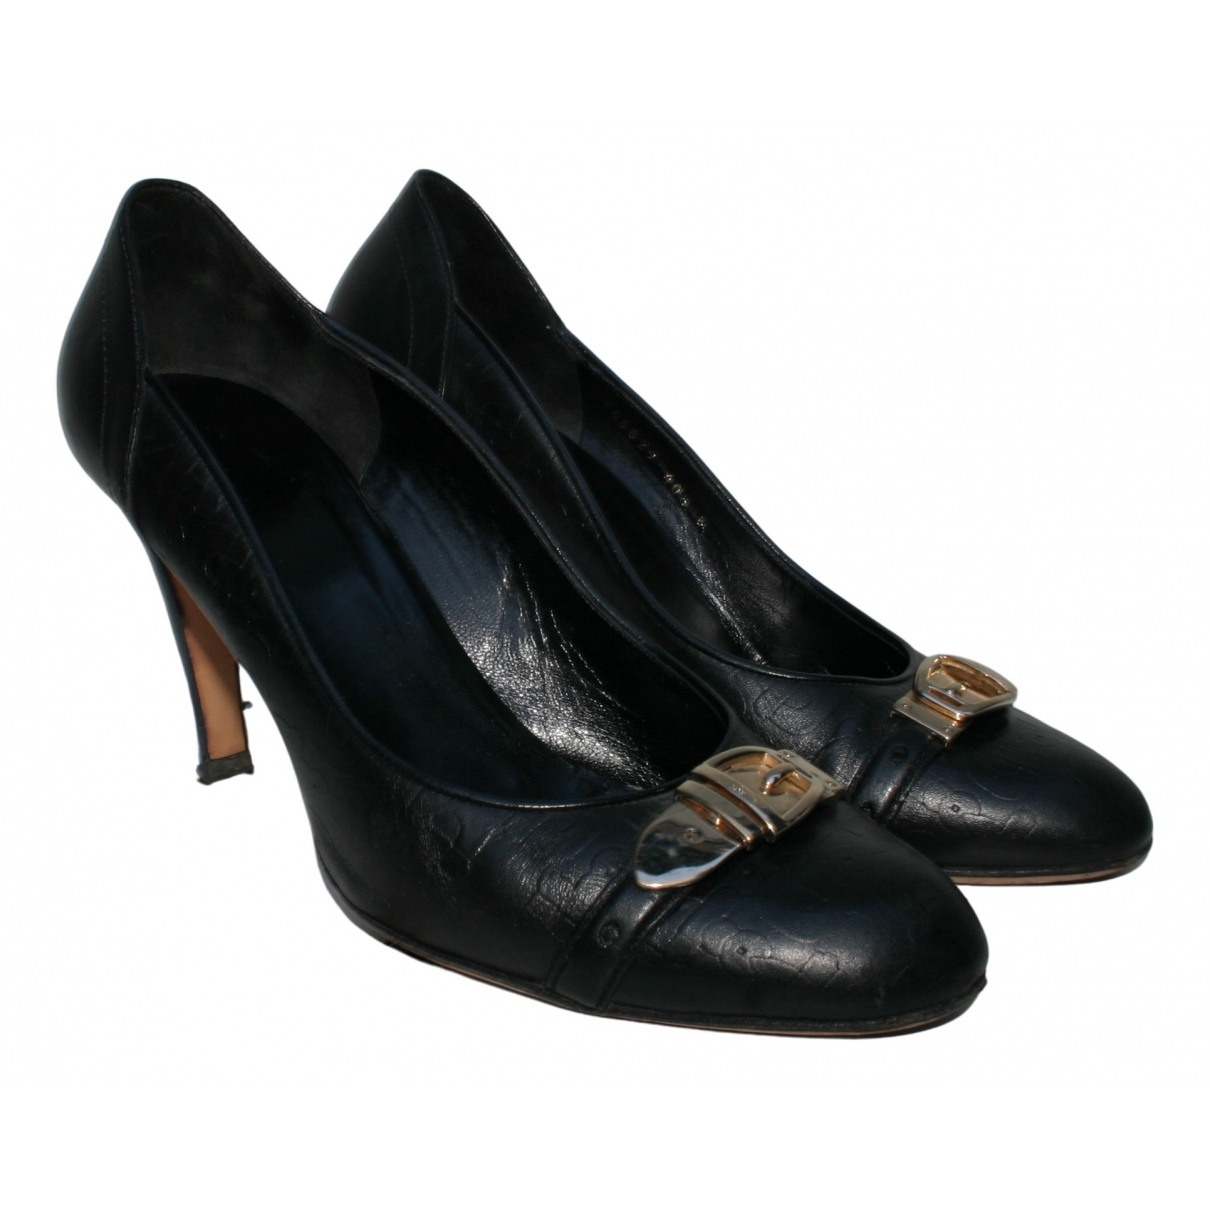 Gucci N Black Leather Heels for Women 40.5 EU